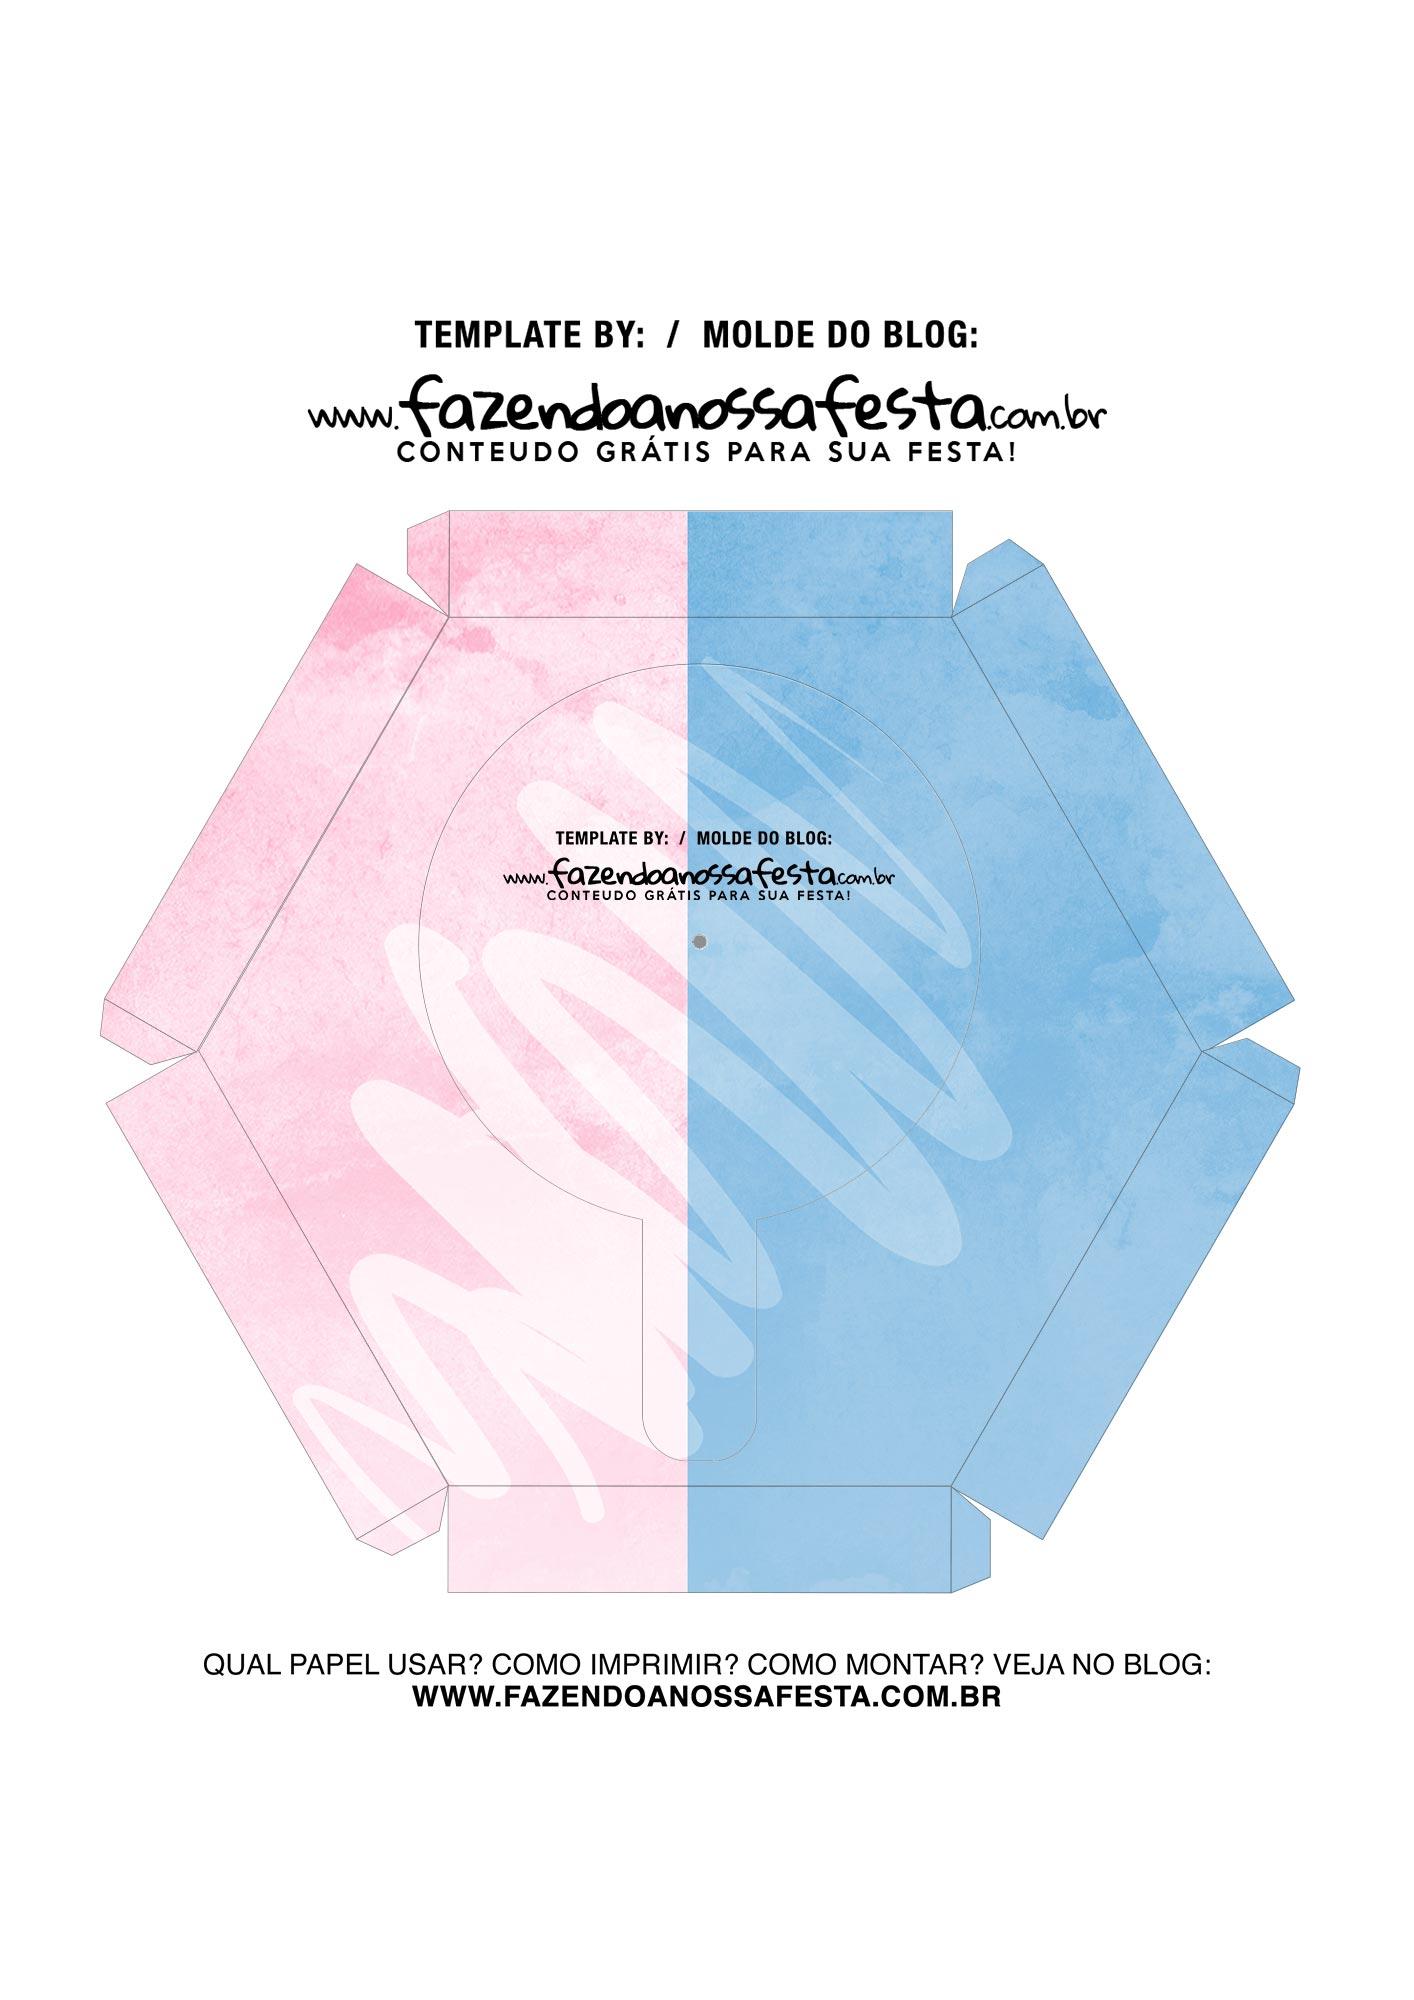 Caixa Explosiva Dia dos Namorados Rosa e Azul 7